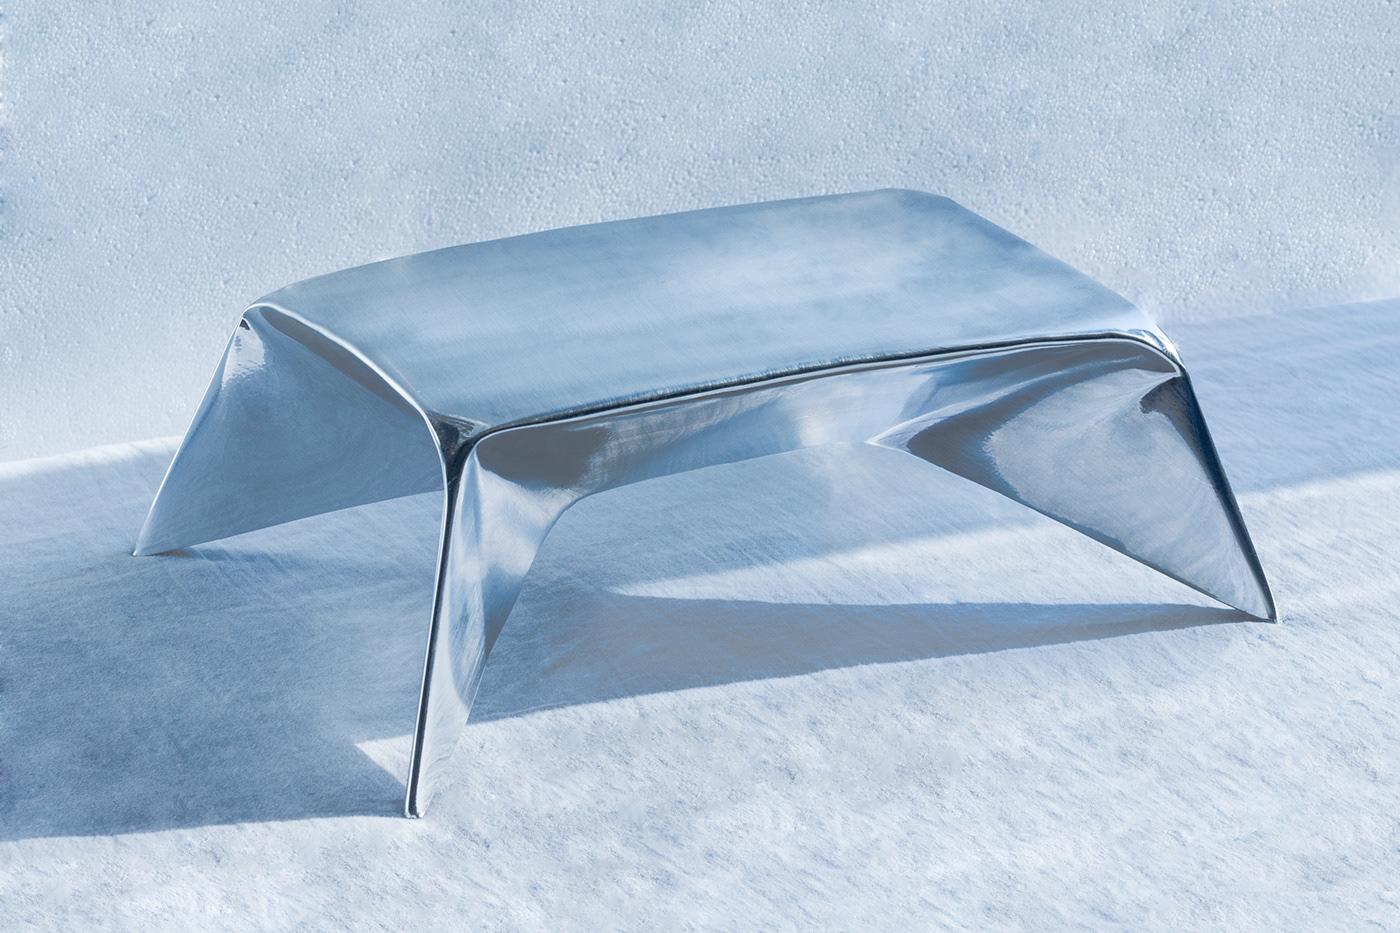 origamy origami  furniture metal furniture sheet metal Metalworking unique furniture innovative furniture minimalist Minimalism origami furniture